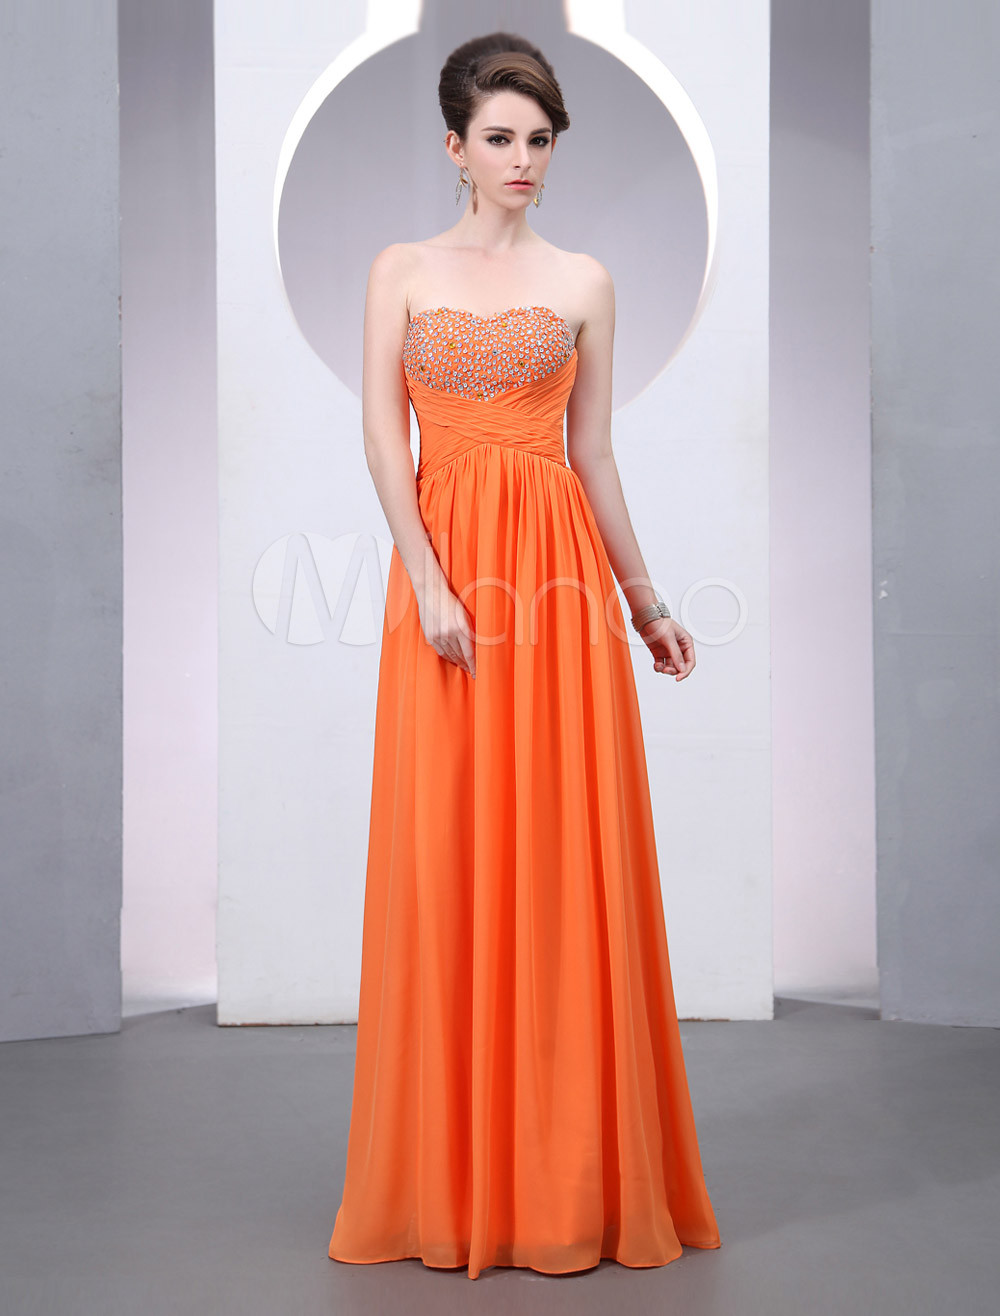 Orange Sweetheart Neck Beading A-line Chiffon Prom Dress